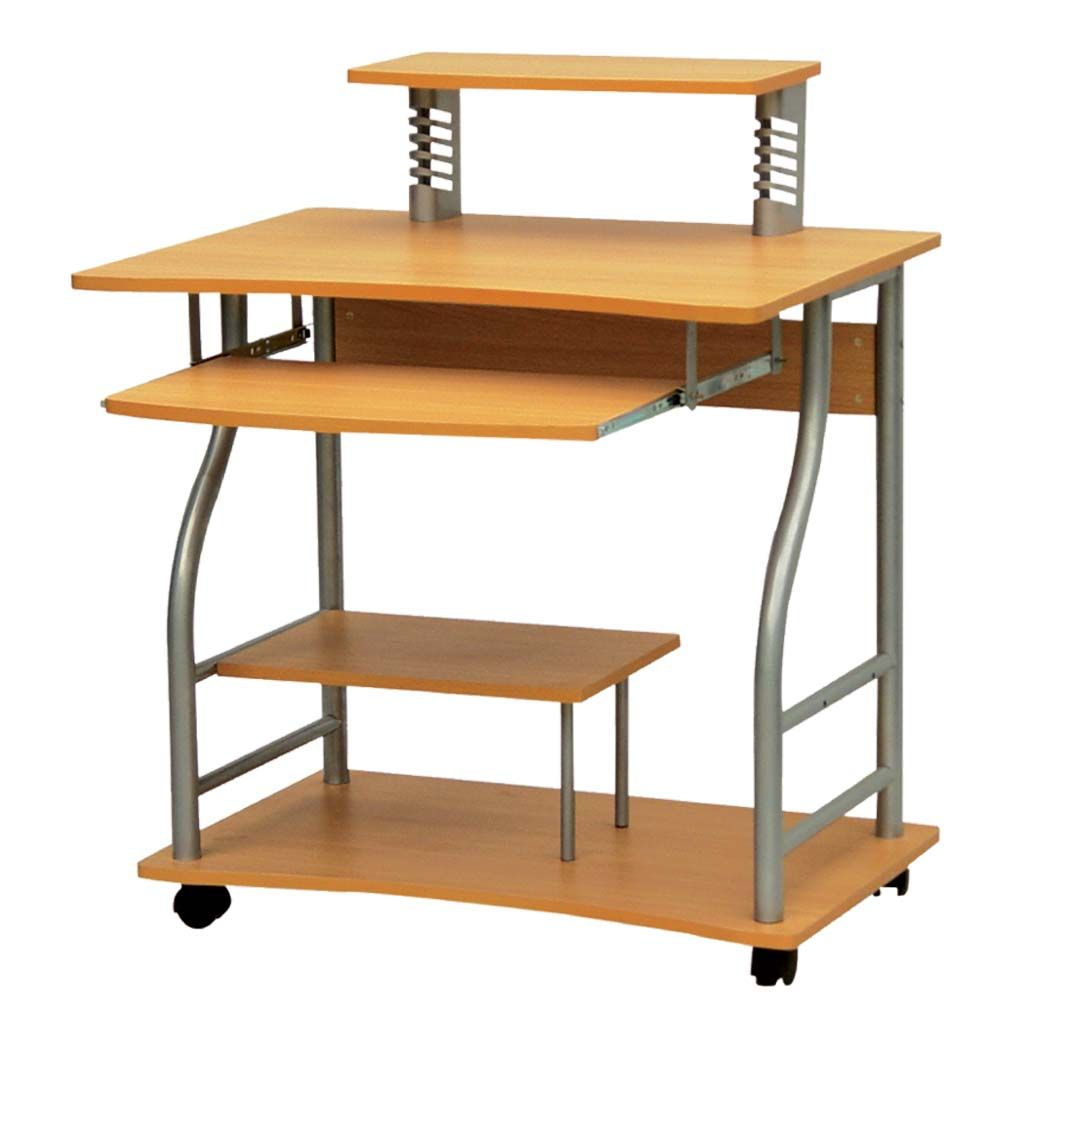 Computer table furniture - Tiring Computer Desk Sijupritea